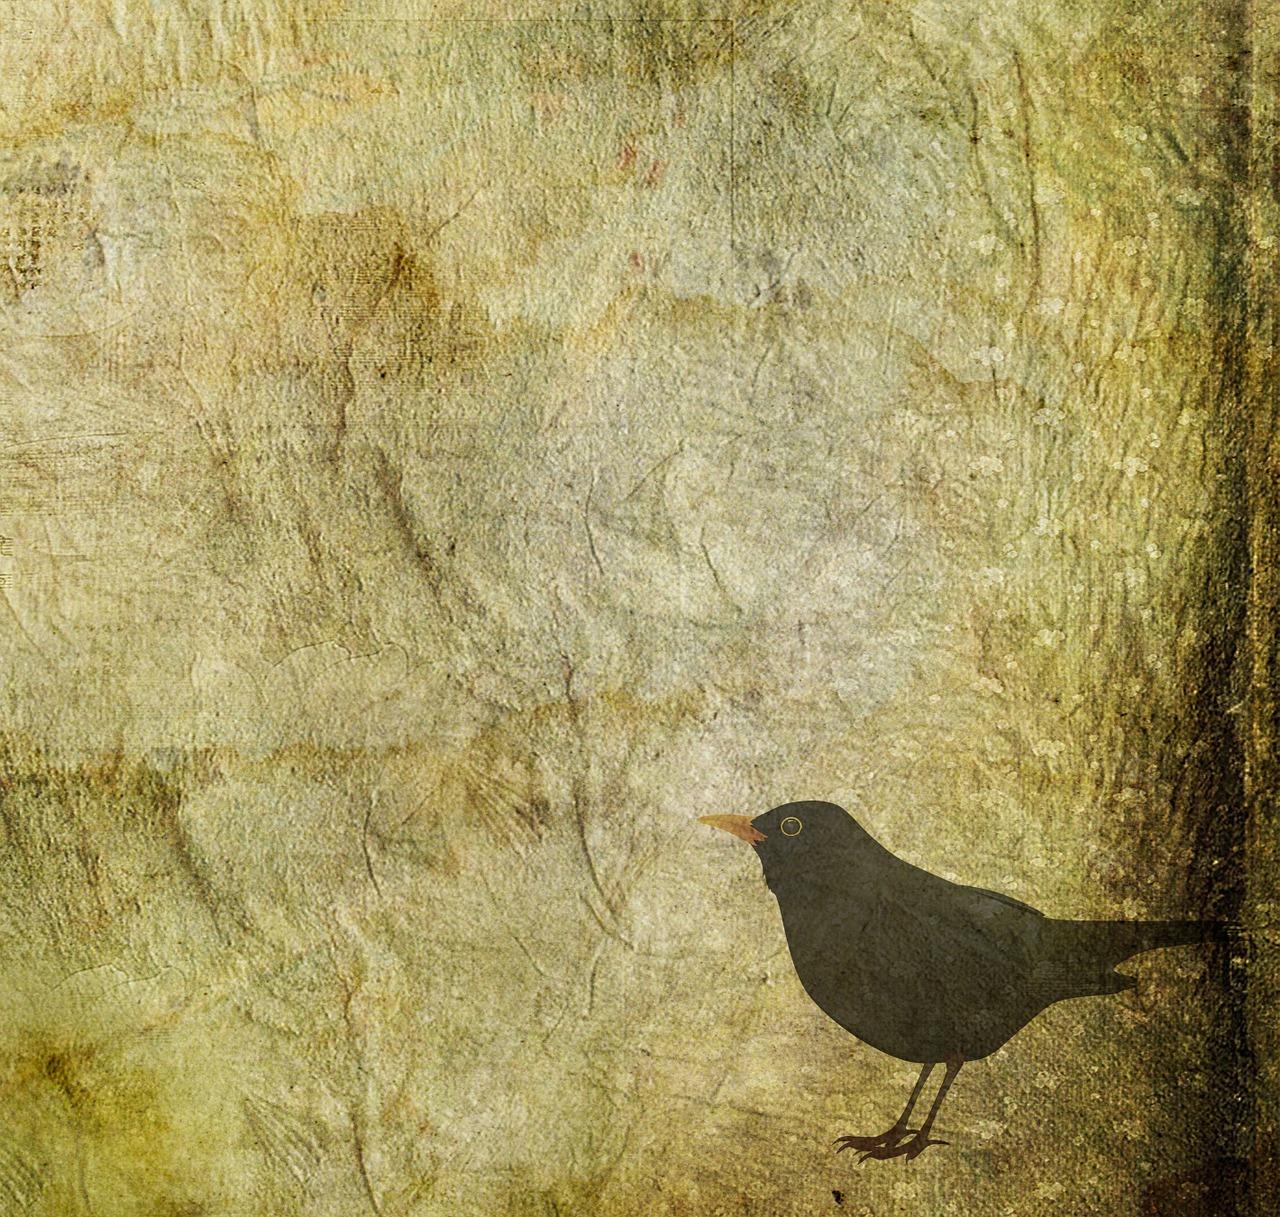 blackbird-1283862_1280